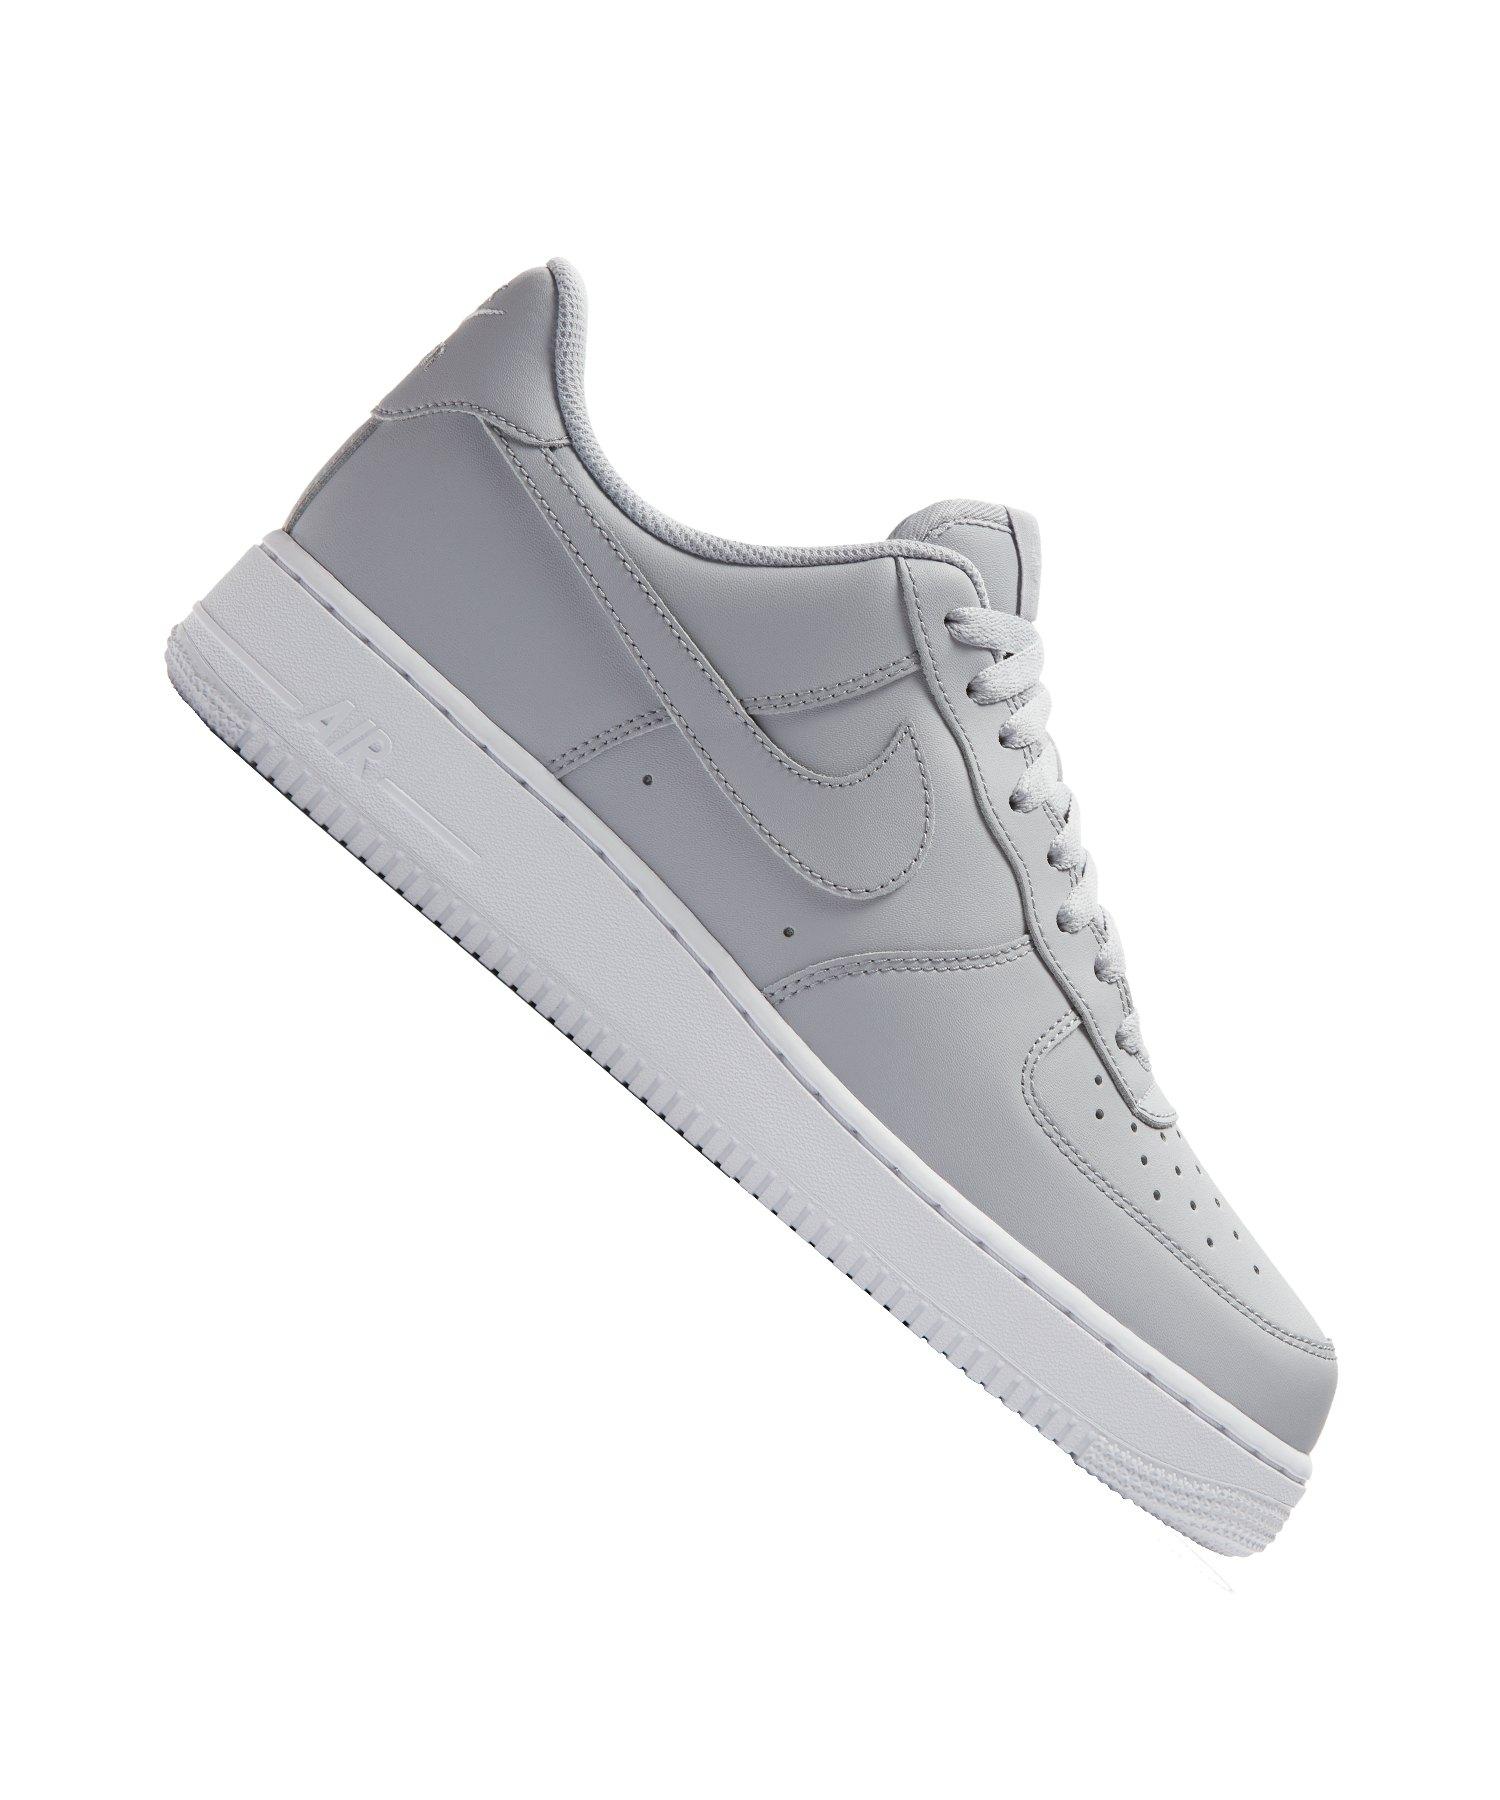 on sale 56473 82cd7 Nike Air Force 1 07 Sneaker Grau Weiss F010 - grau